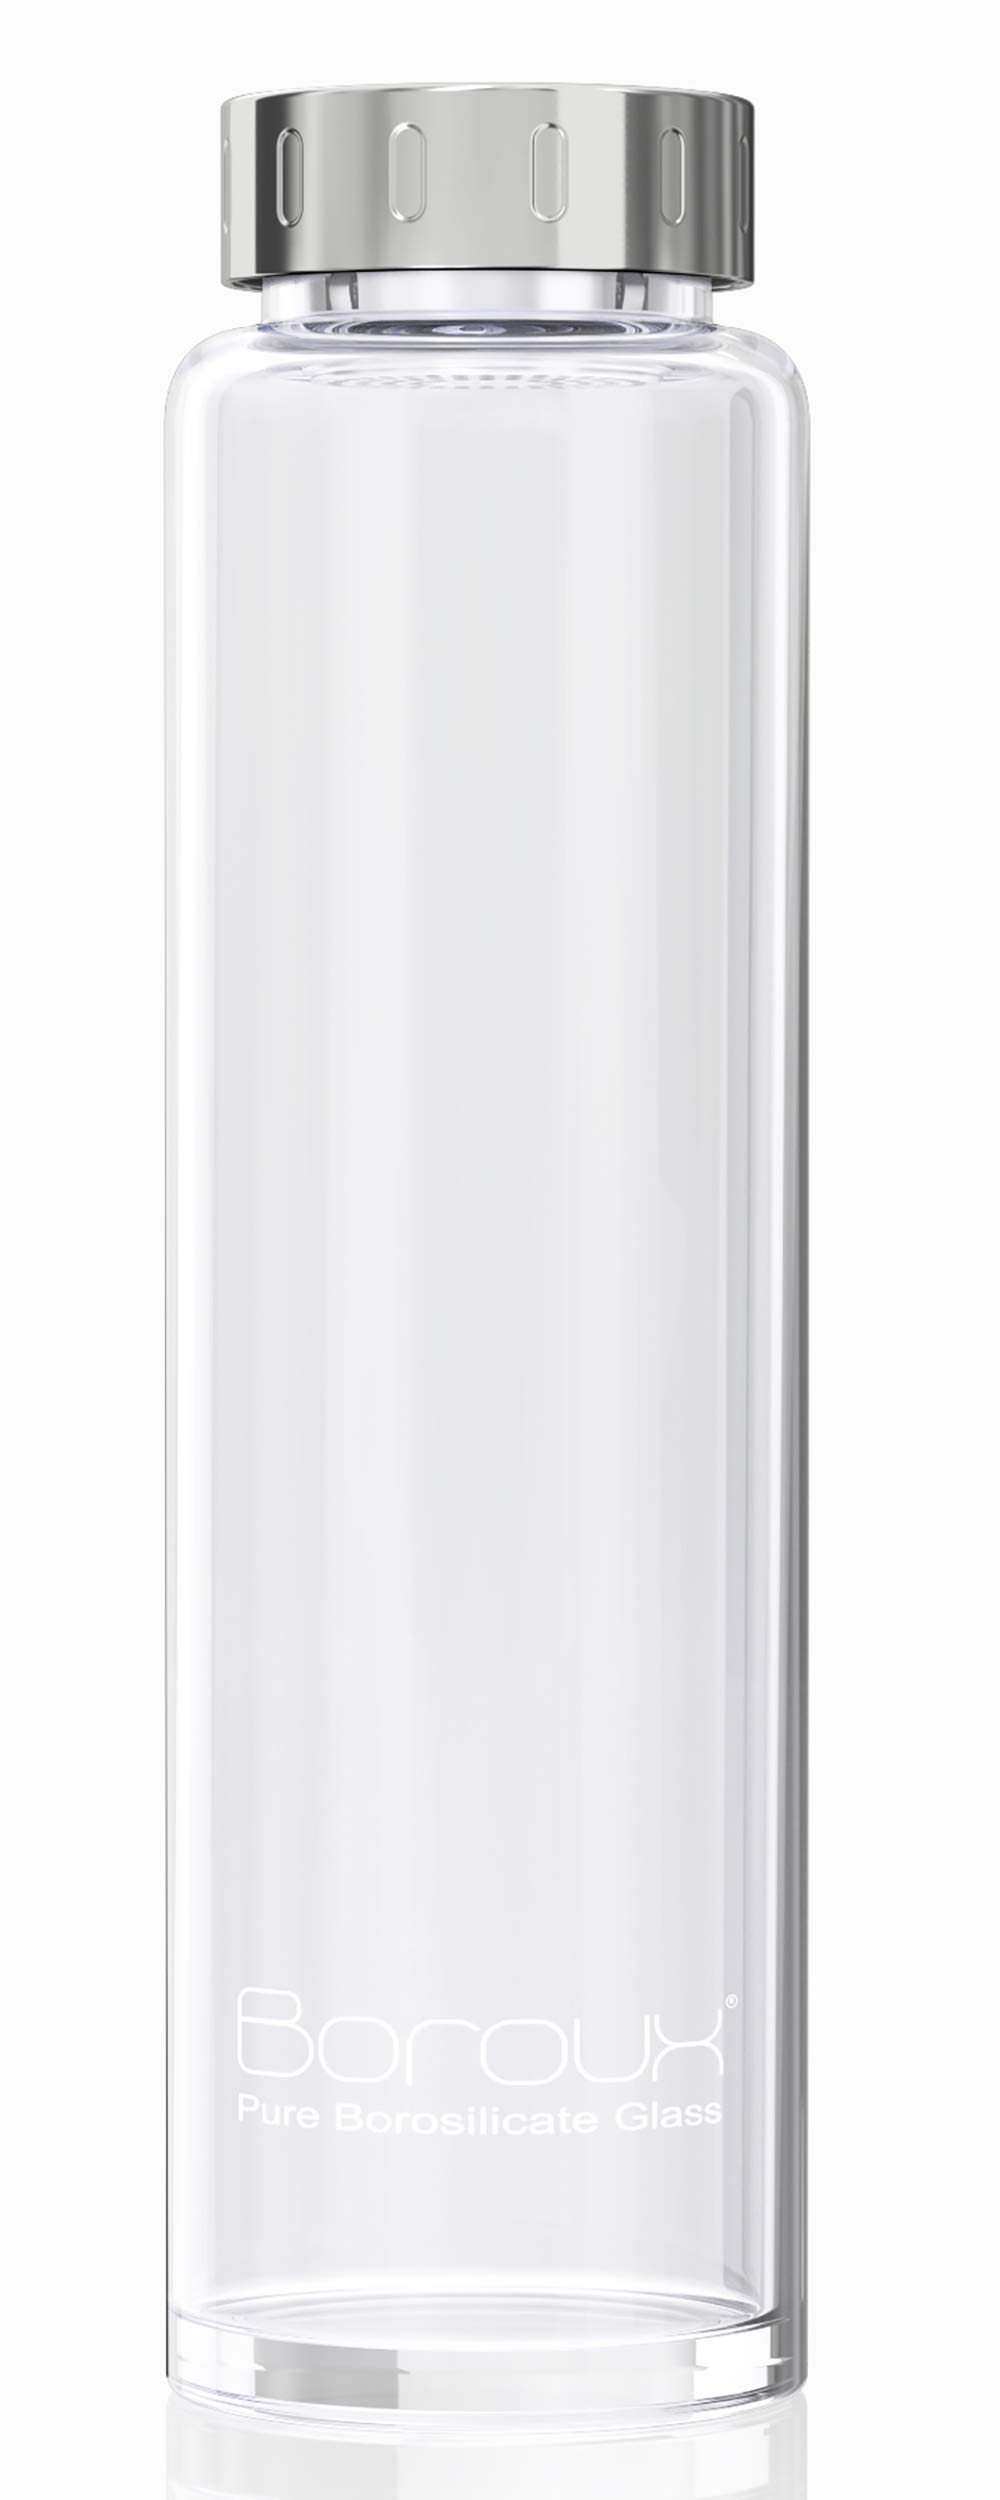 Boroux Original Glass Water Bottle 1 Liter, Handmade from Eco Friendly, BPA Free, Pure Borosilicate Glass (1 Liter)